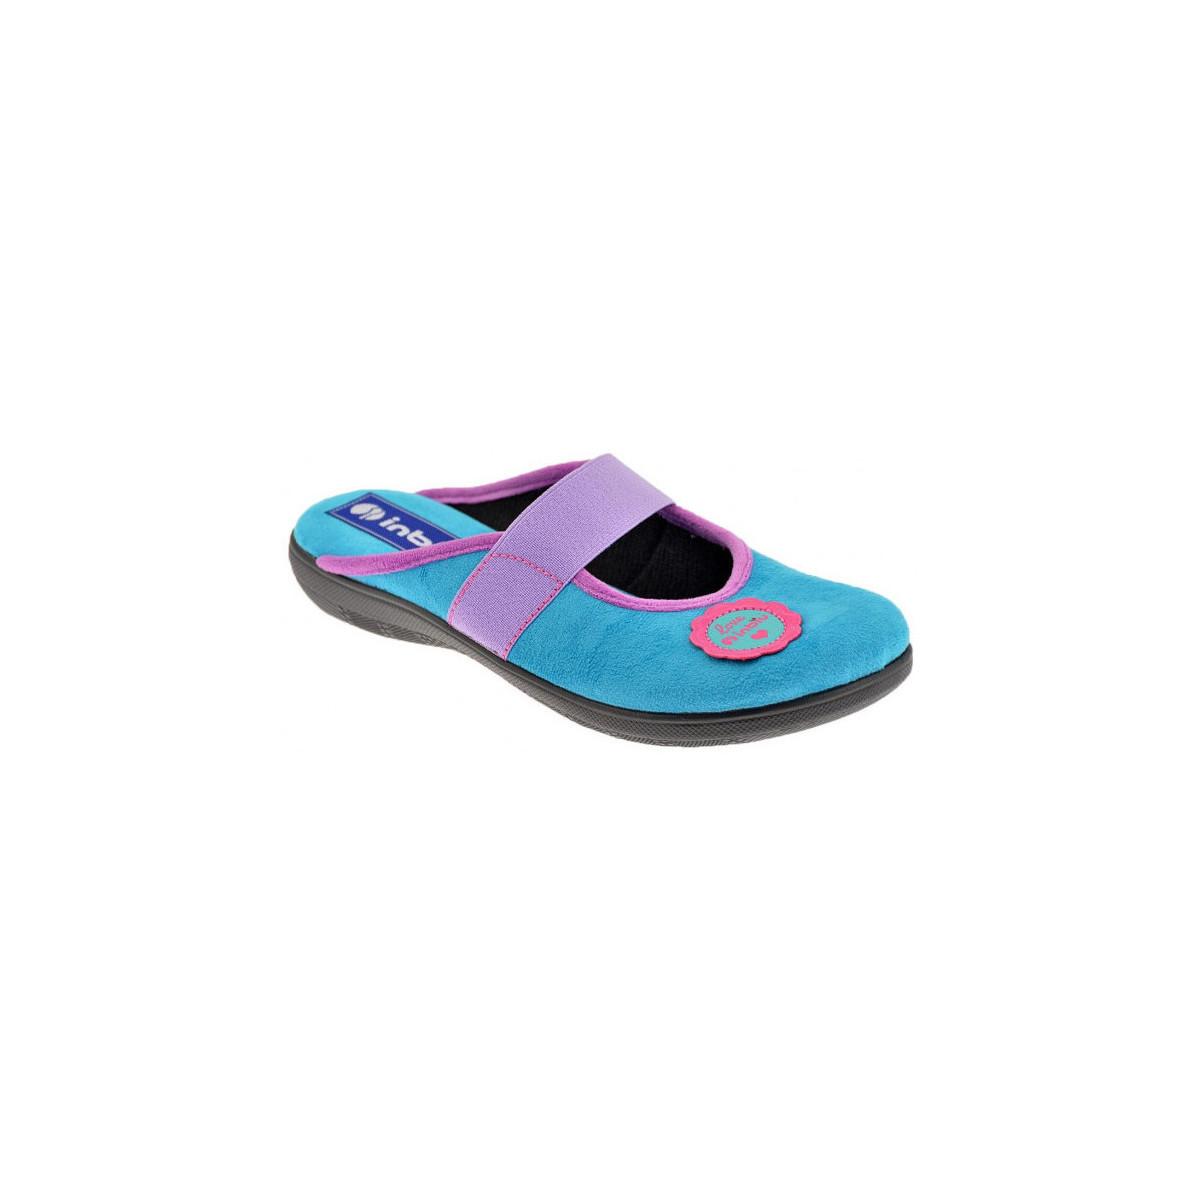 inblu aimer pantoufles chaussures mules femme 19 00. Black Bedroom Furniture Sets. Home Design Ideas